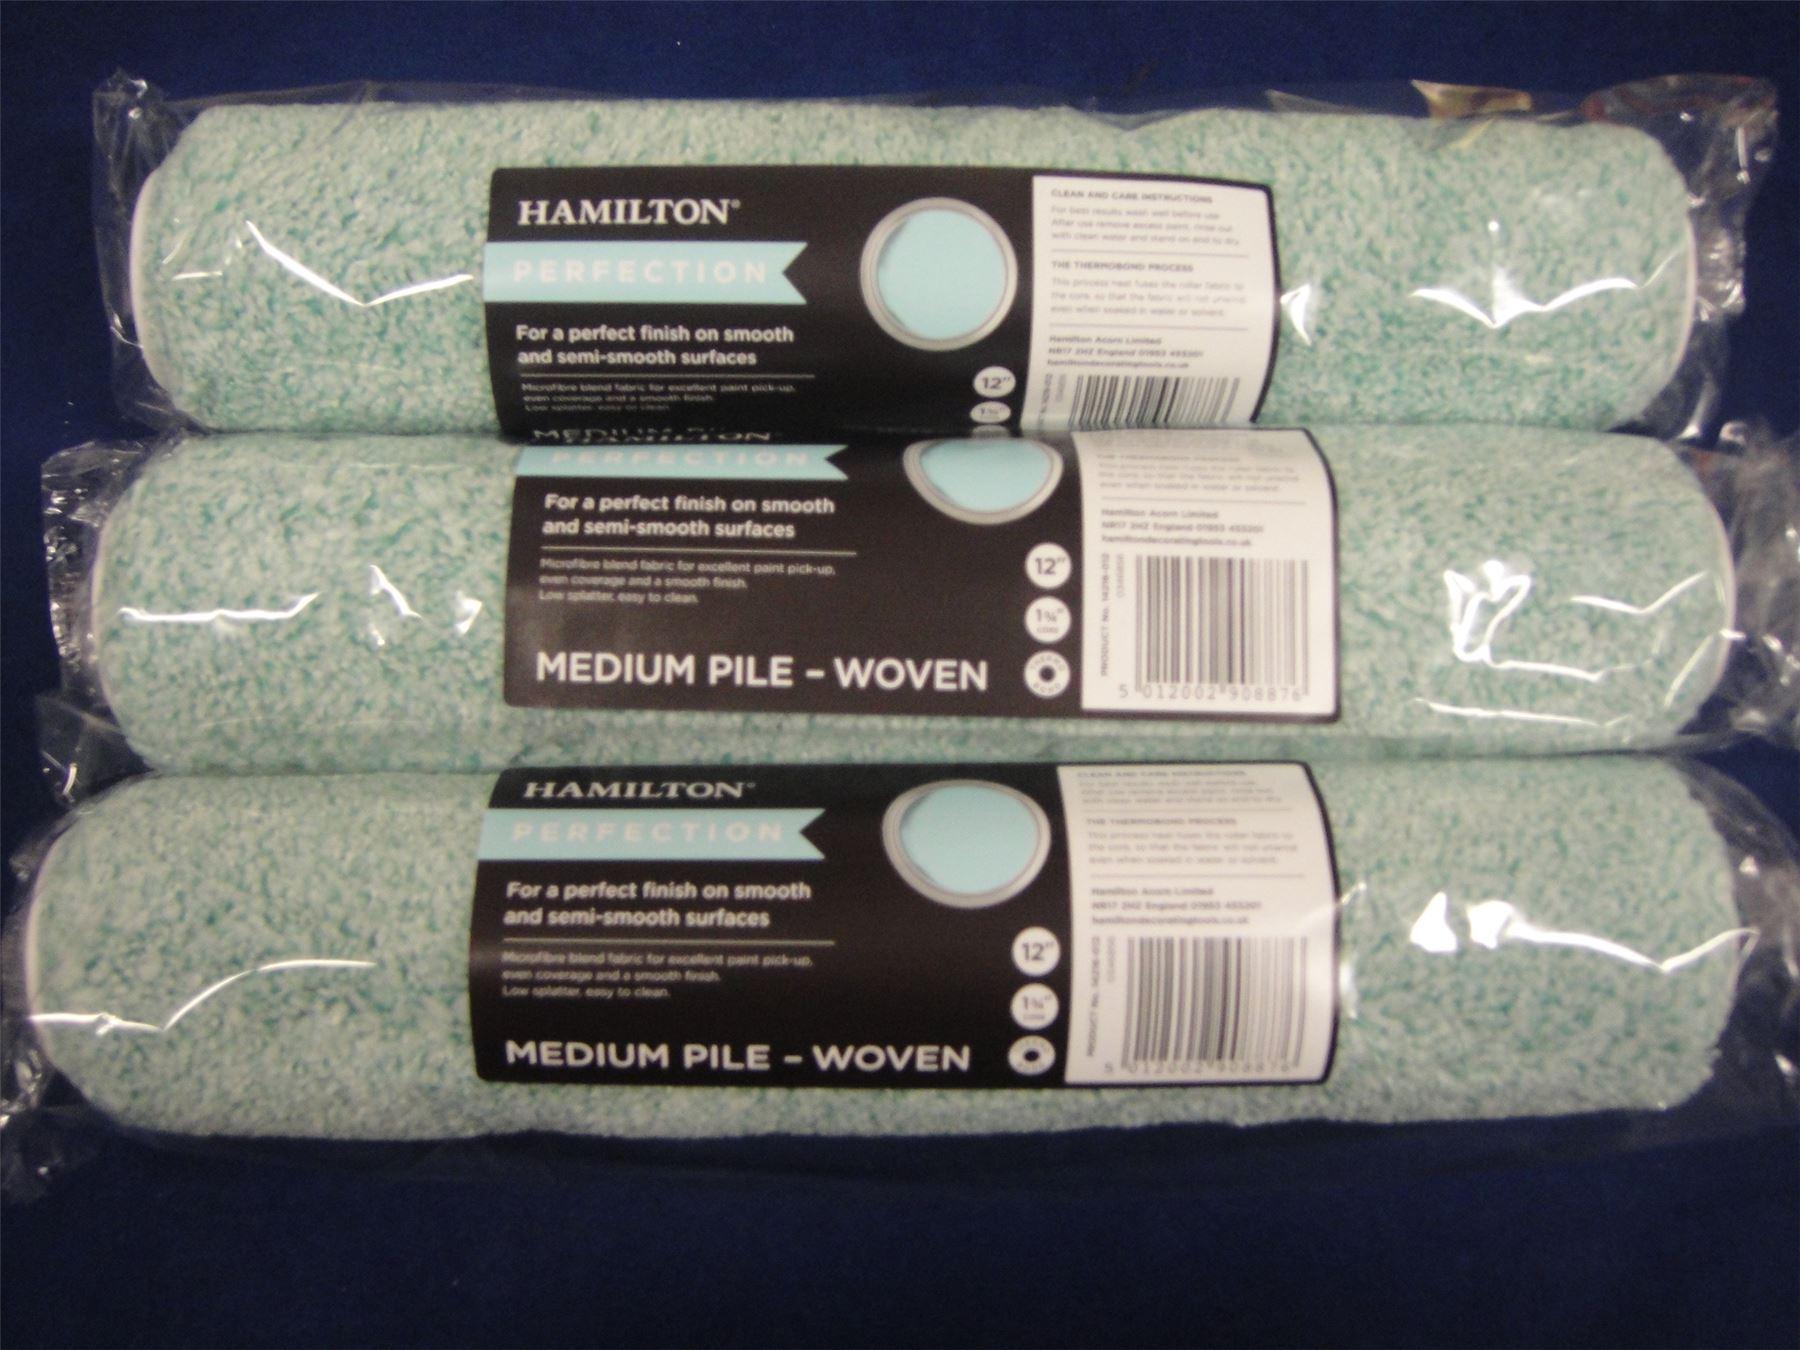 Hamilton Perfection Roller Sleeve Extra Long Pile 12 x 44